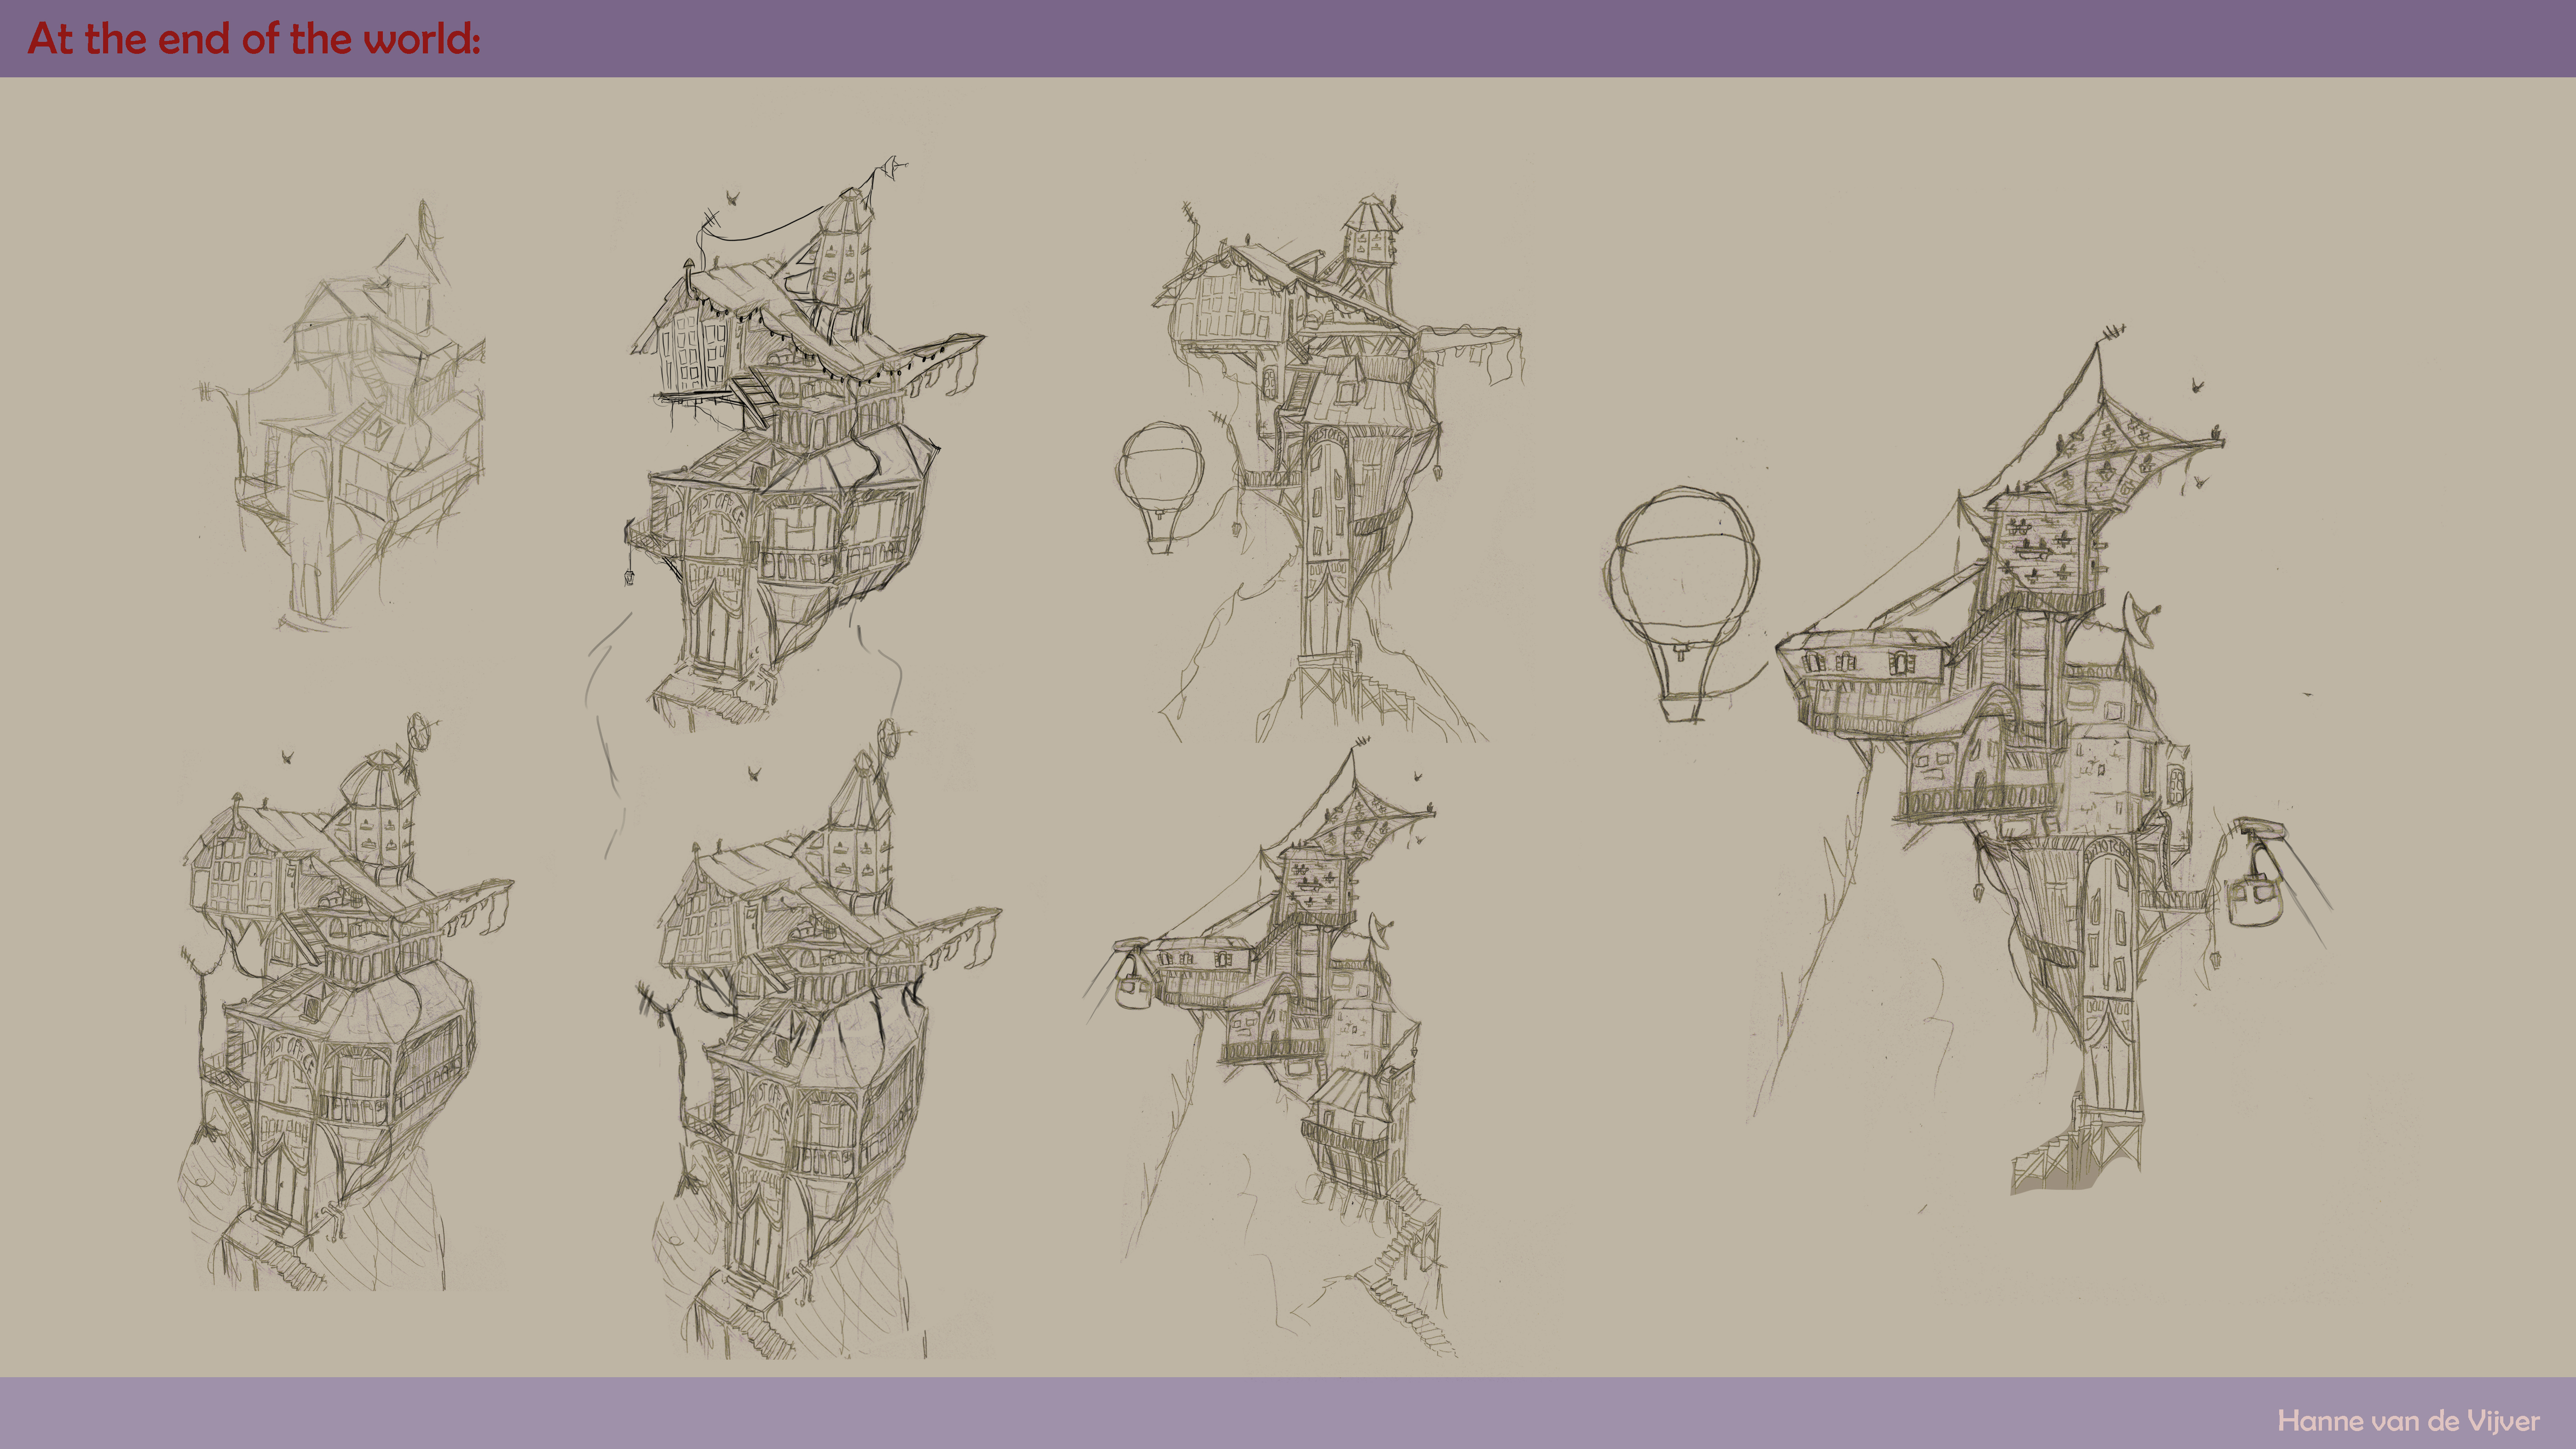 AtTheEndsOfTheWorld_02_sketches